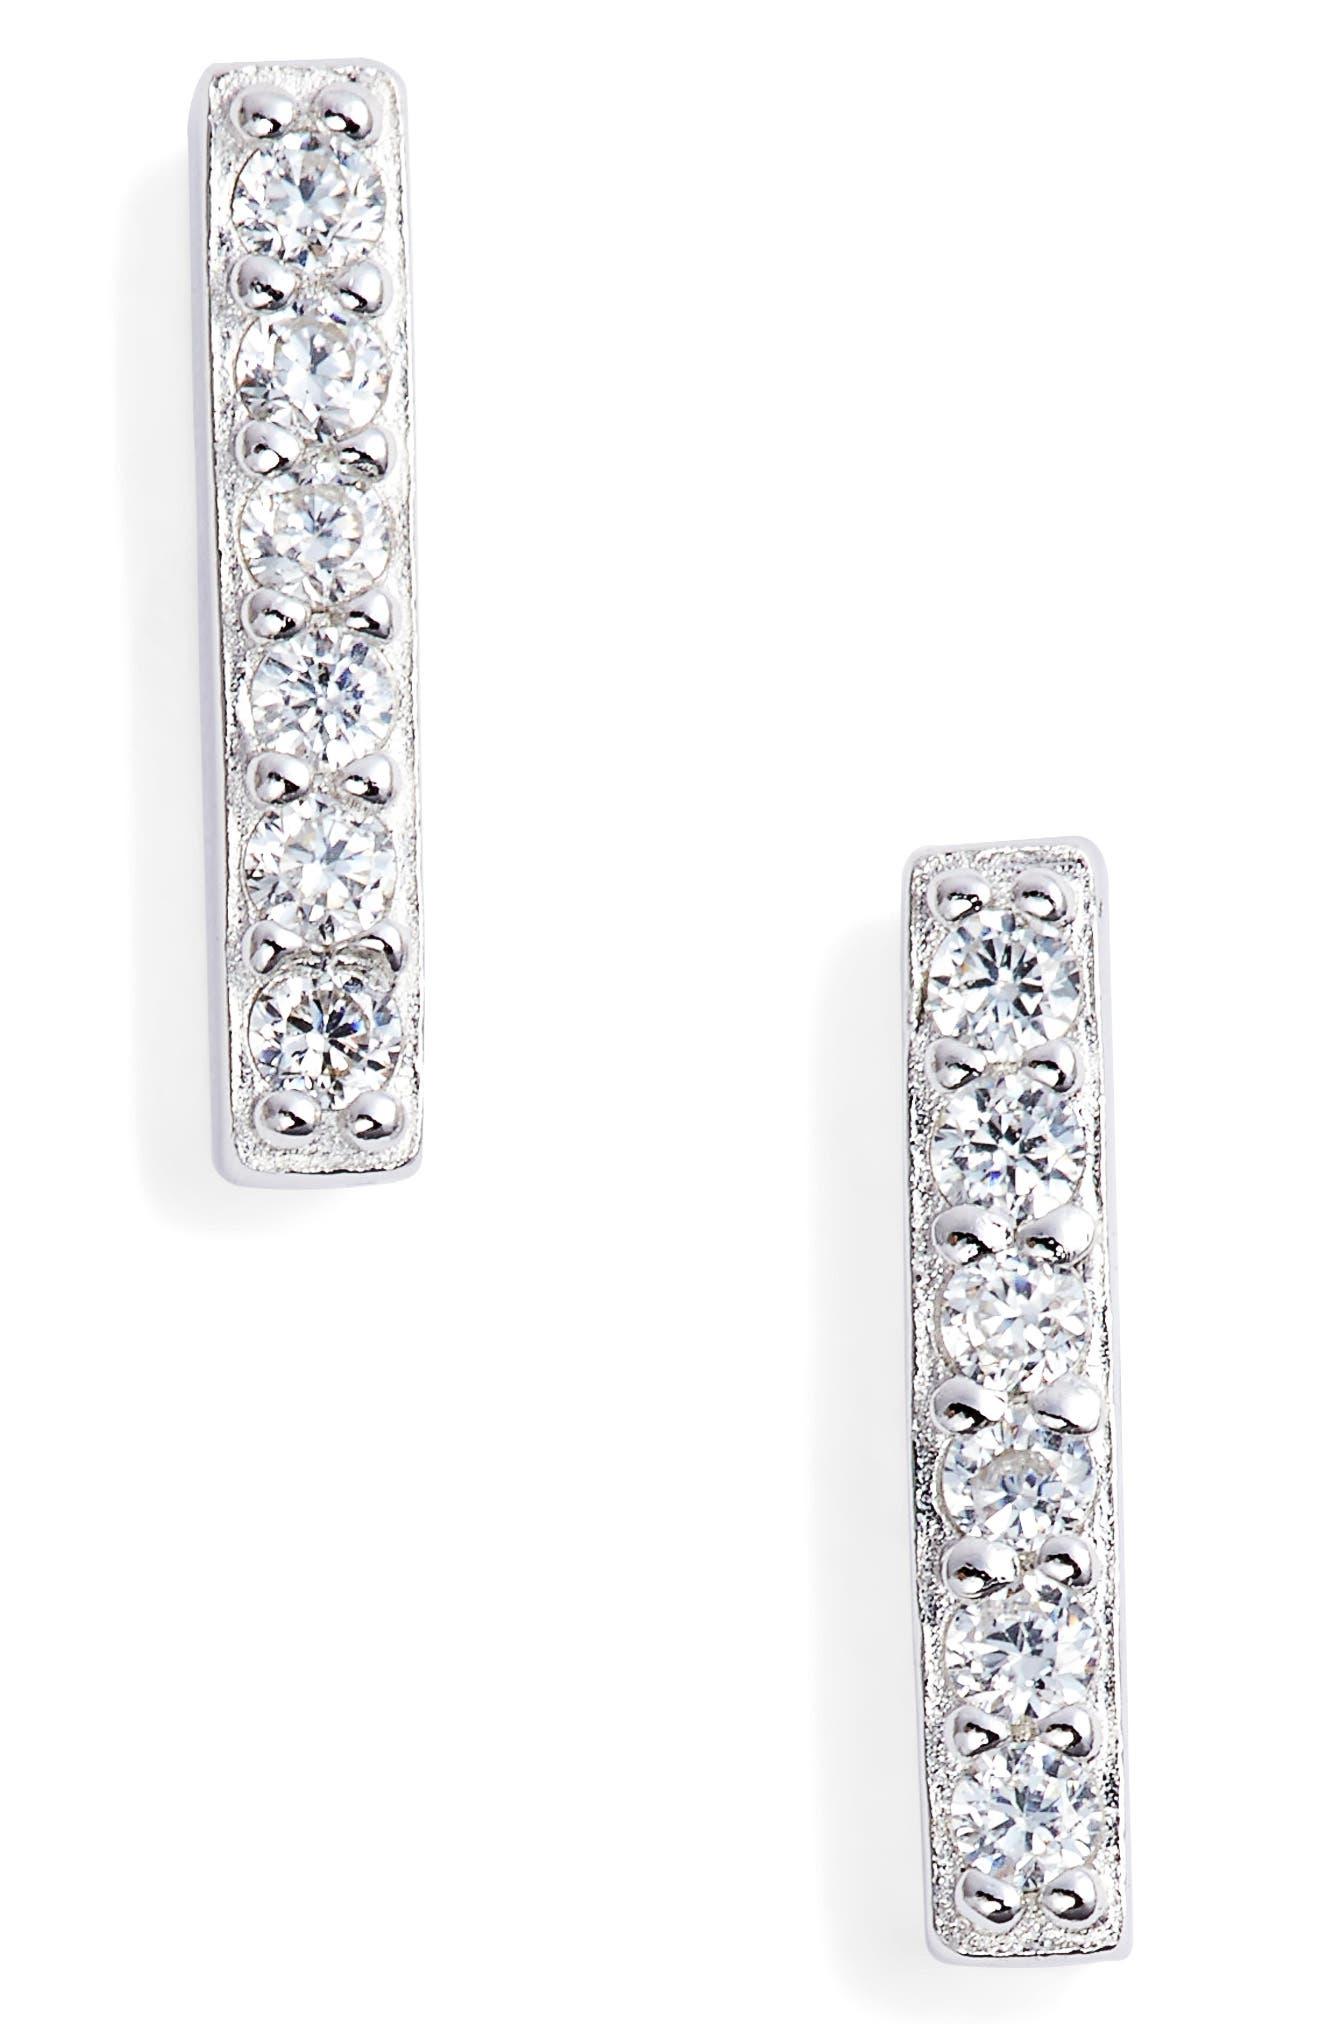 Main Image - Nordstrom Precious Metal Plated Cubic Zirconia Bar Earrings